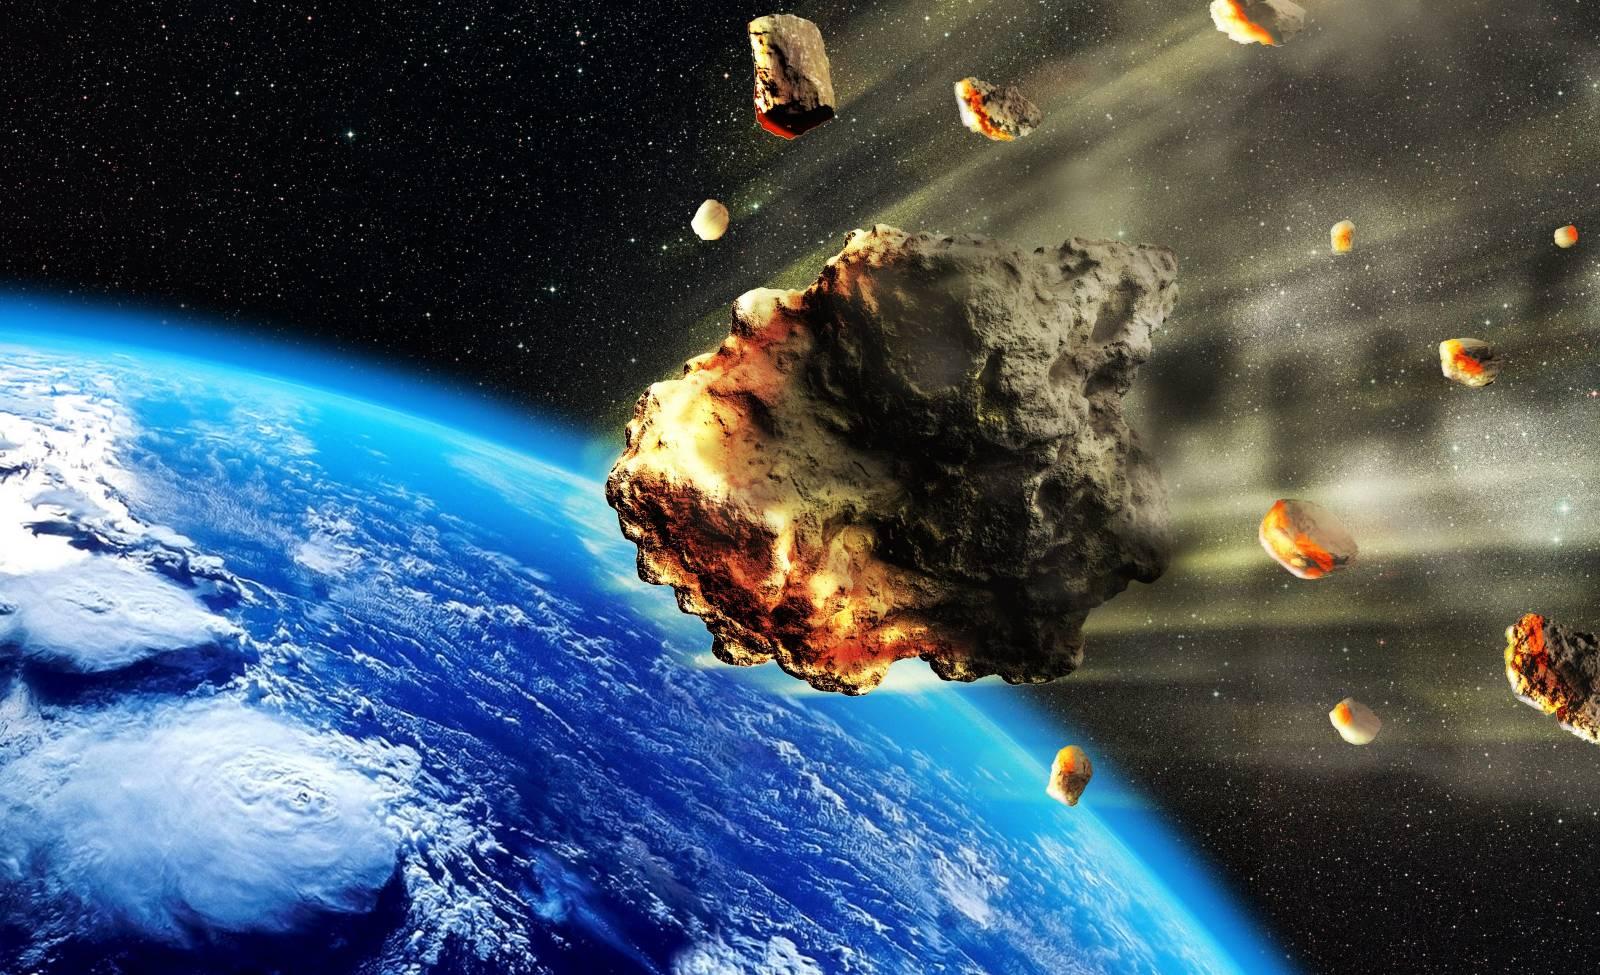 NASA DETECTAT MARE ASTEROID